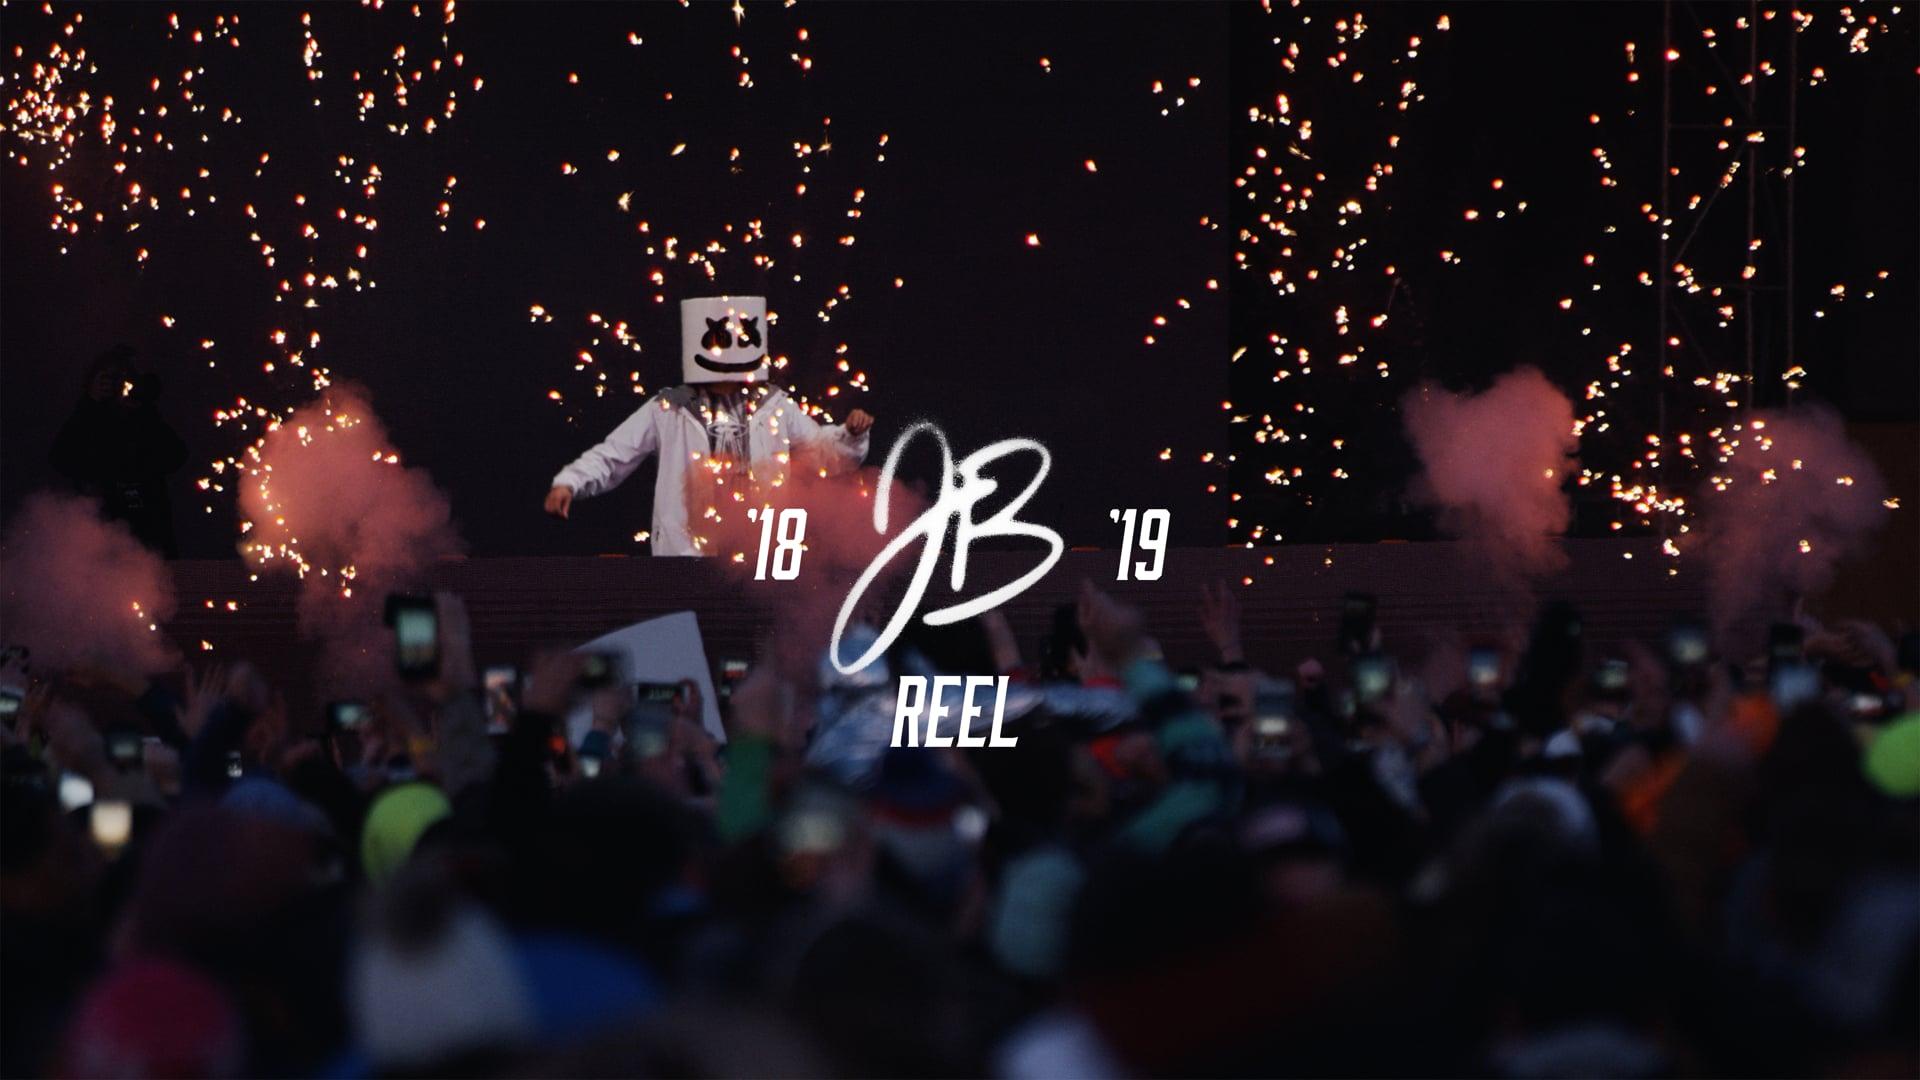 '18/'19 Reel